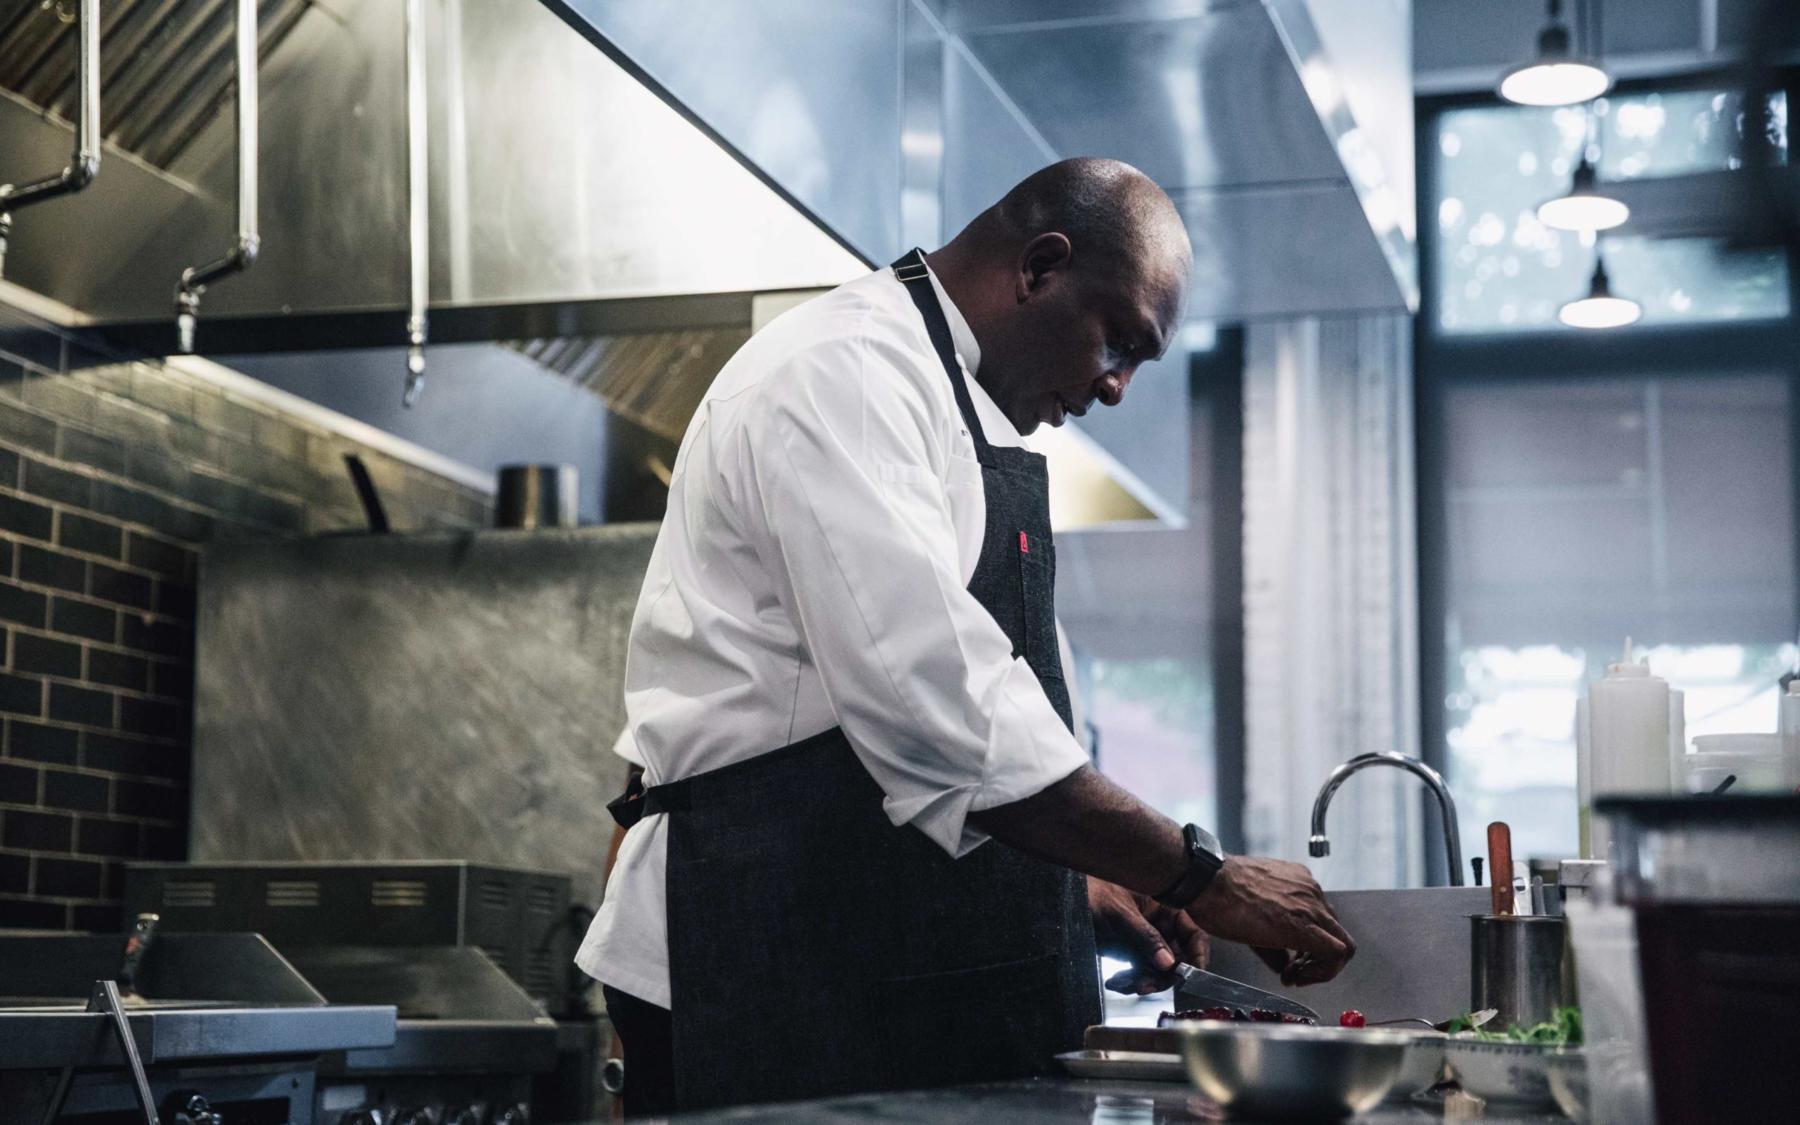 Black Chefs – Erick Williams of Virtue Chicago